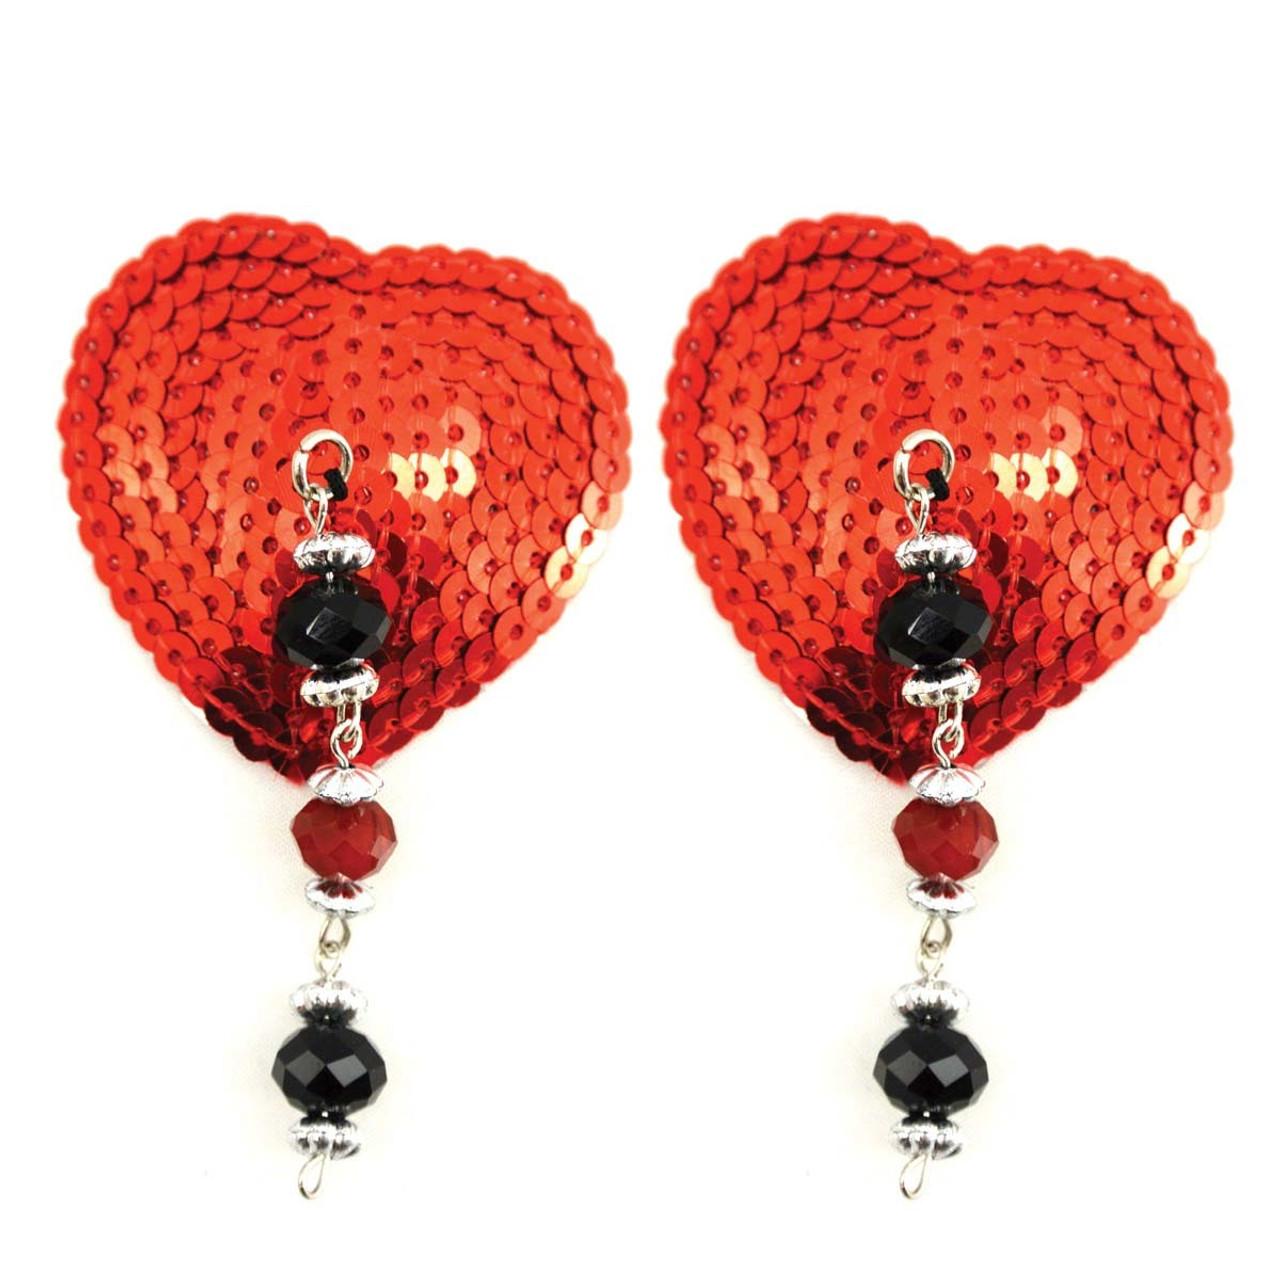 V-Day Accessories